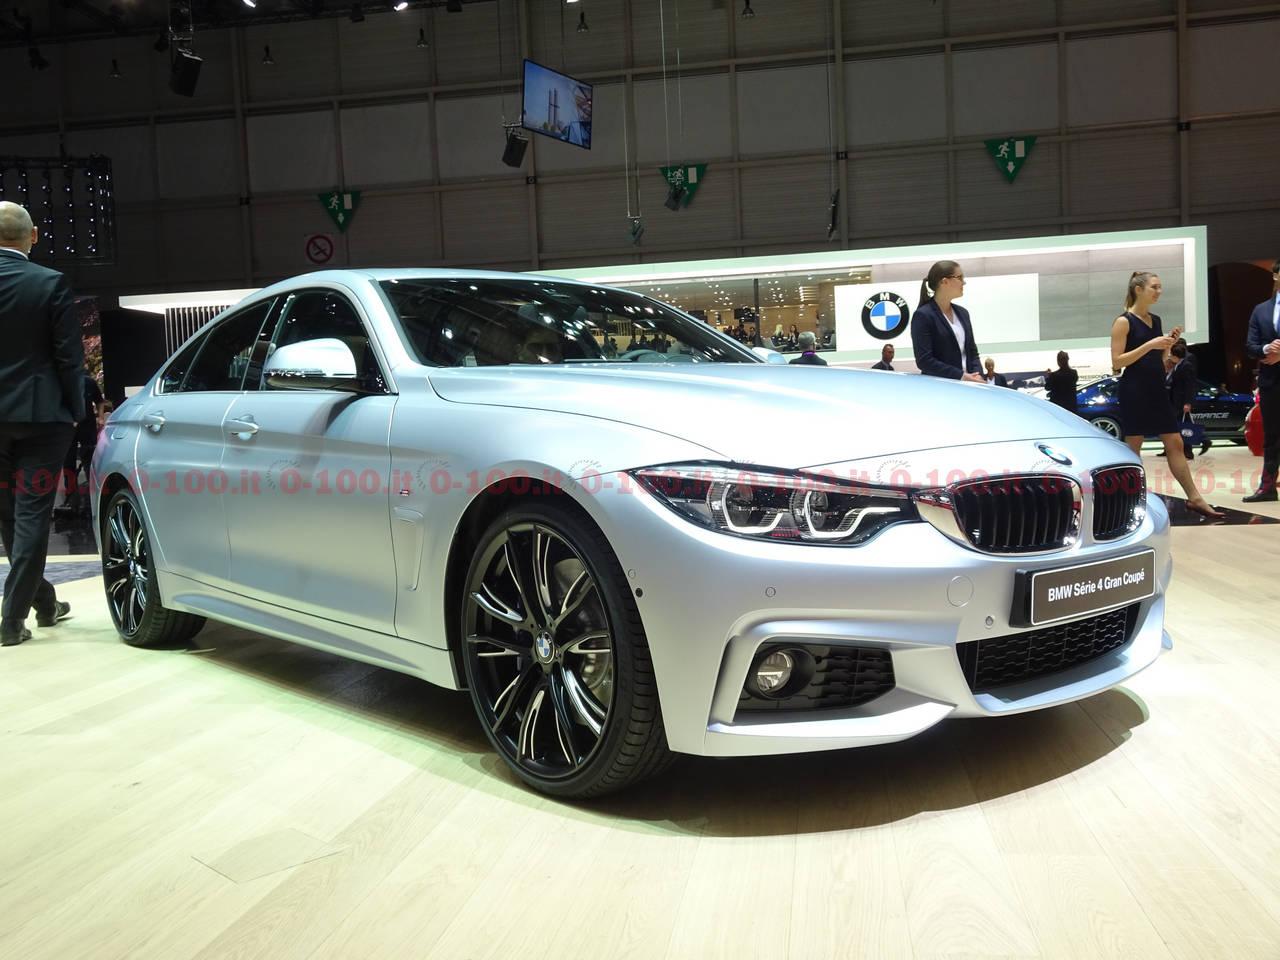 Ginevra-geneva-geneve-2017-BMW_Serie-4-gran-coupe_0-100_2